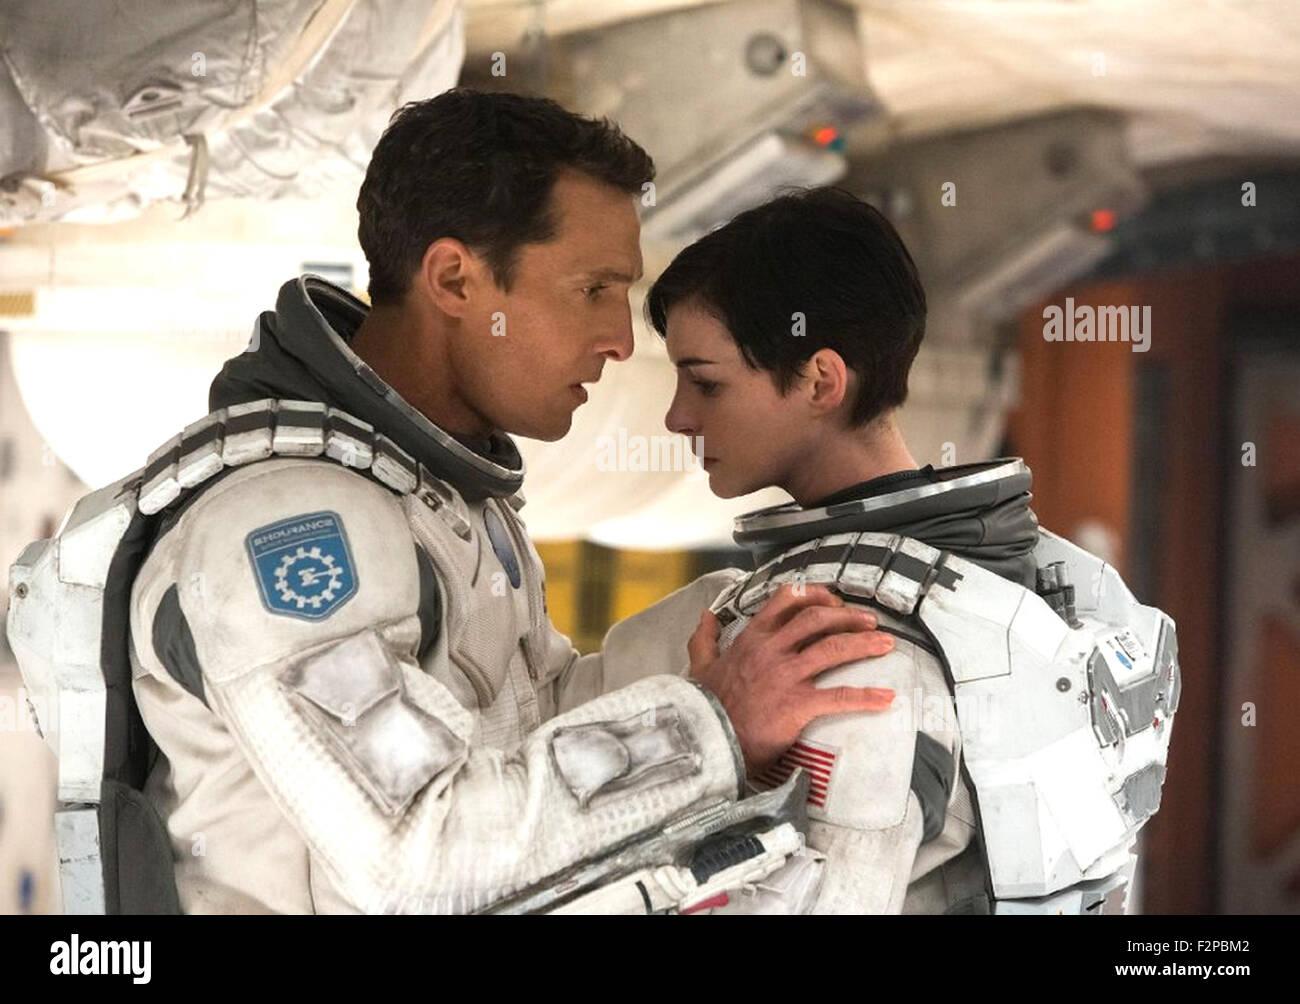 INTERSTELLAR 2014 Warner Bros film with Anne Hathaway and Matthew McConaughey - Stock Image